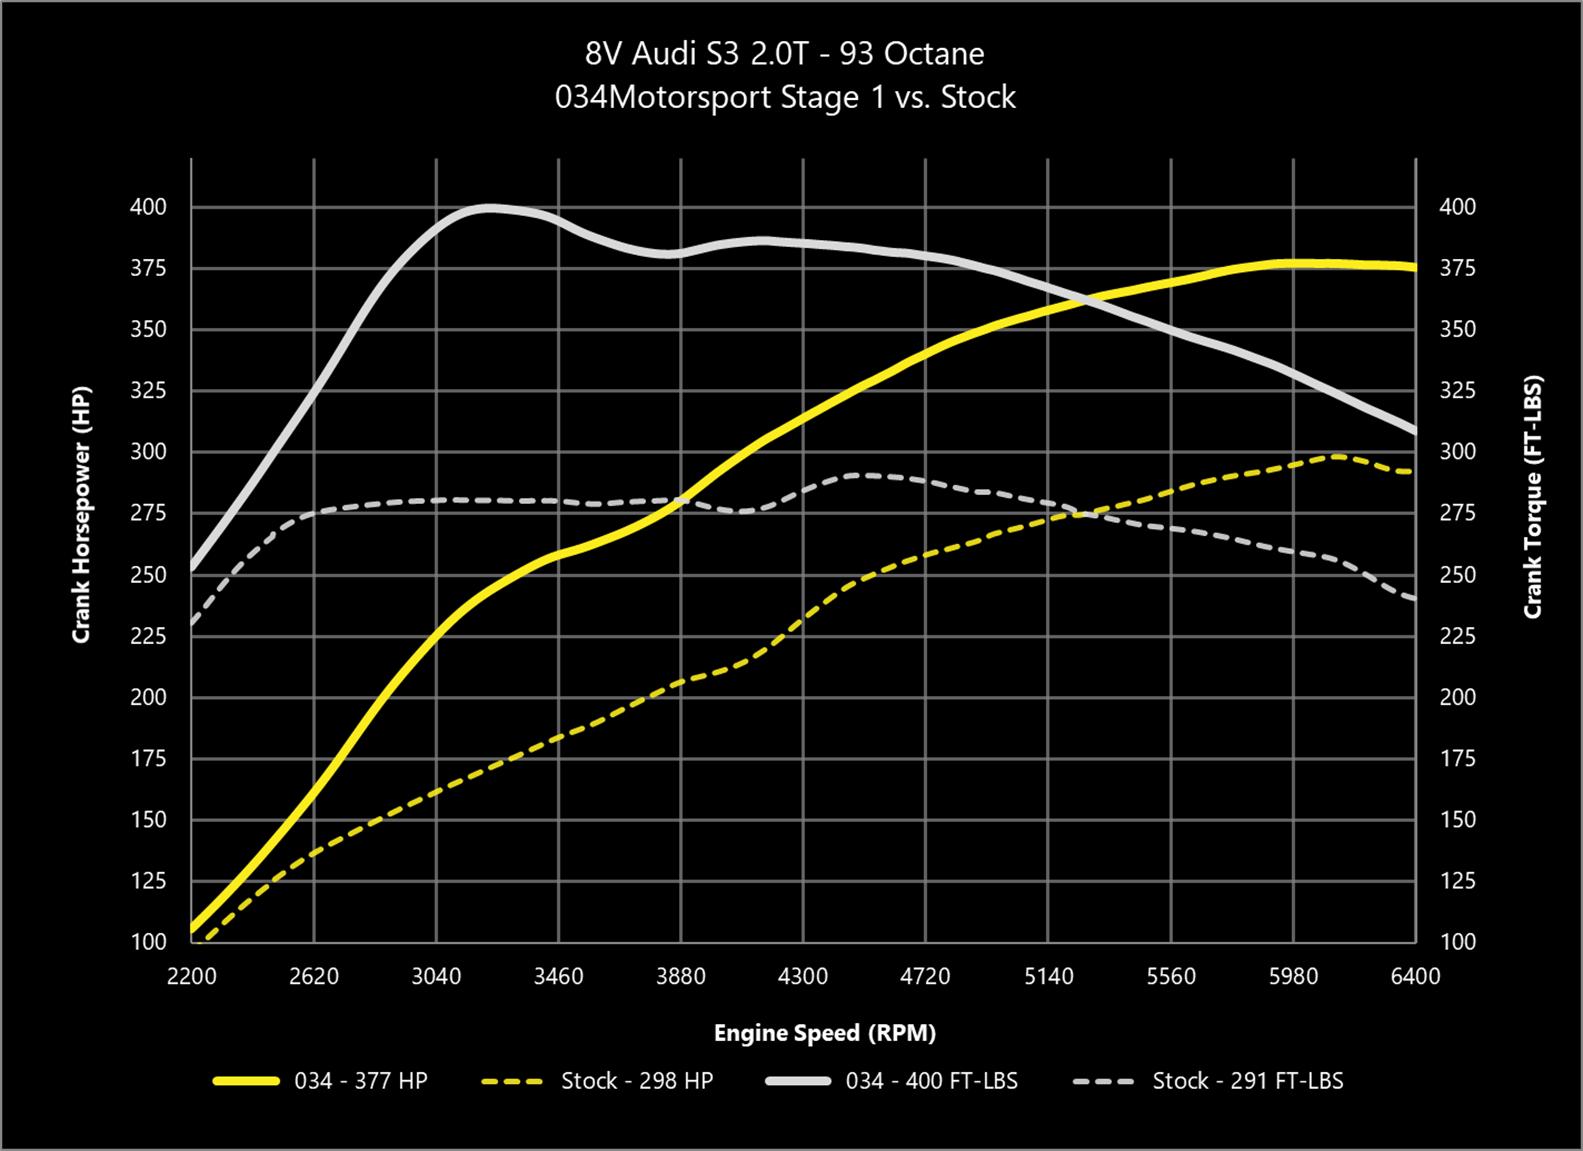 034Motorsport 2 0T Gen 3 (IS38) Performance Software, 8V/8S Audi S3/TTS &  MkVII Volkswagen Golf R